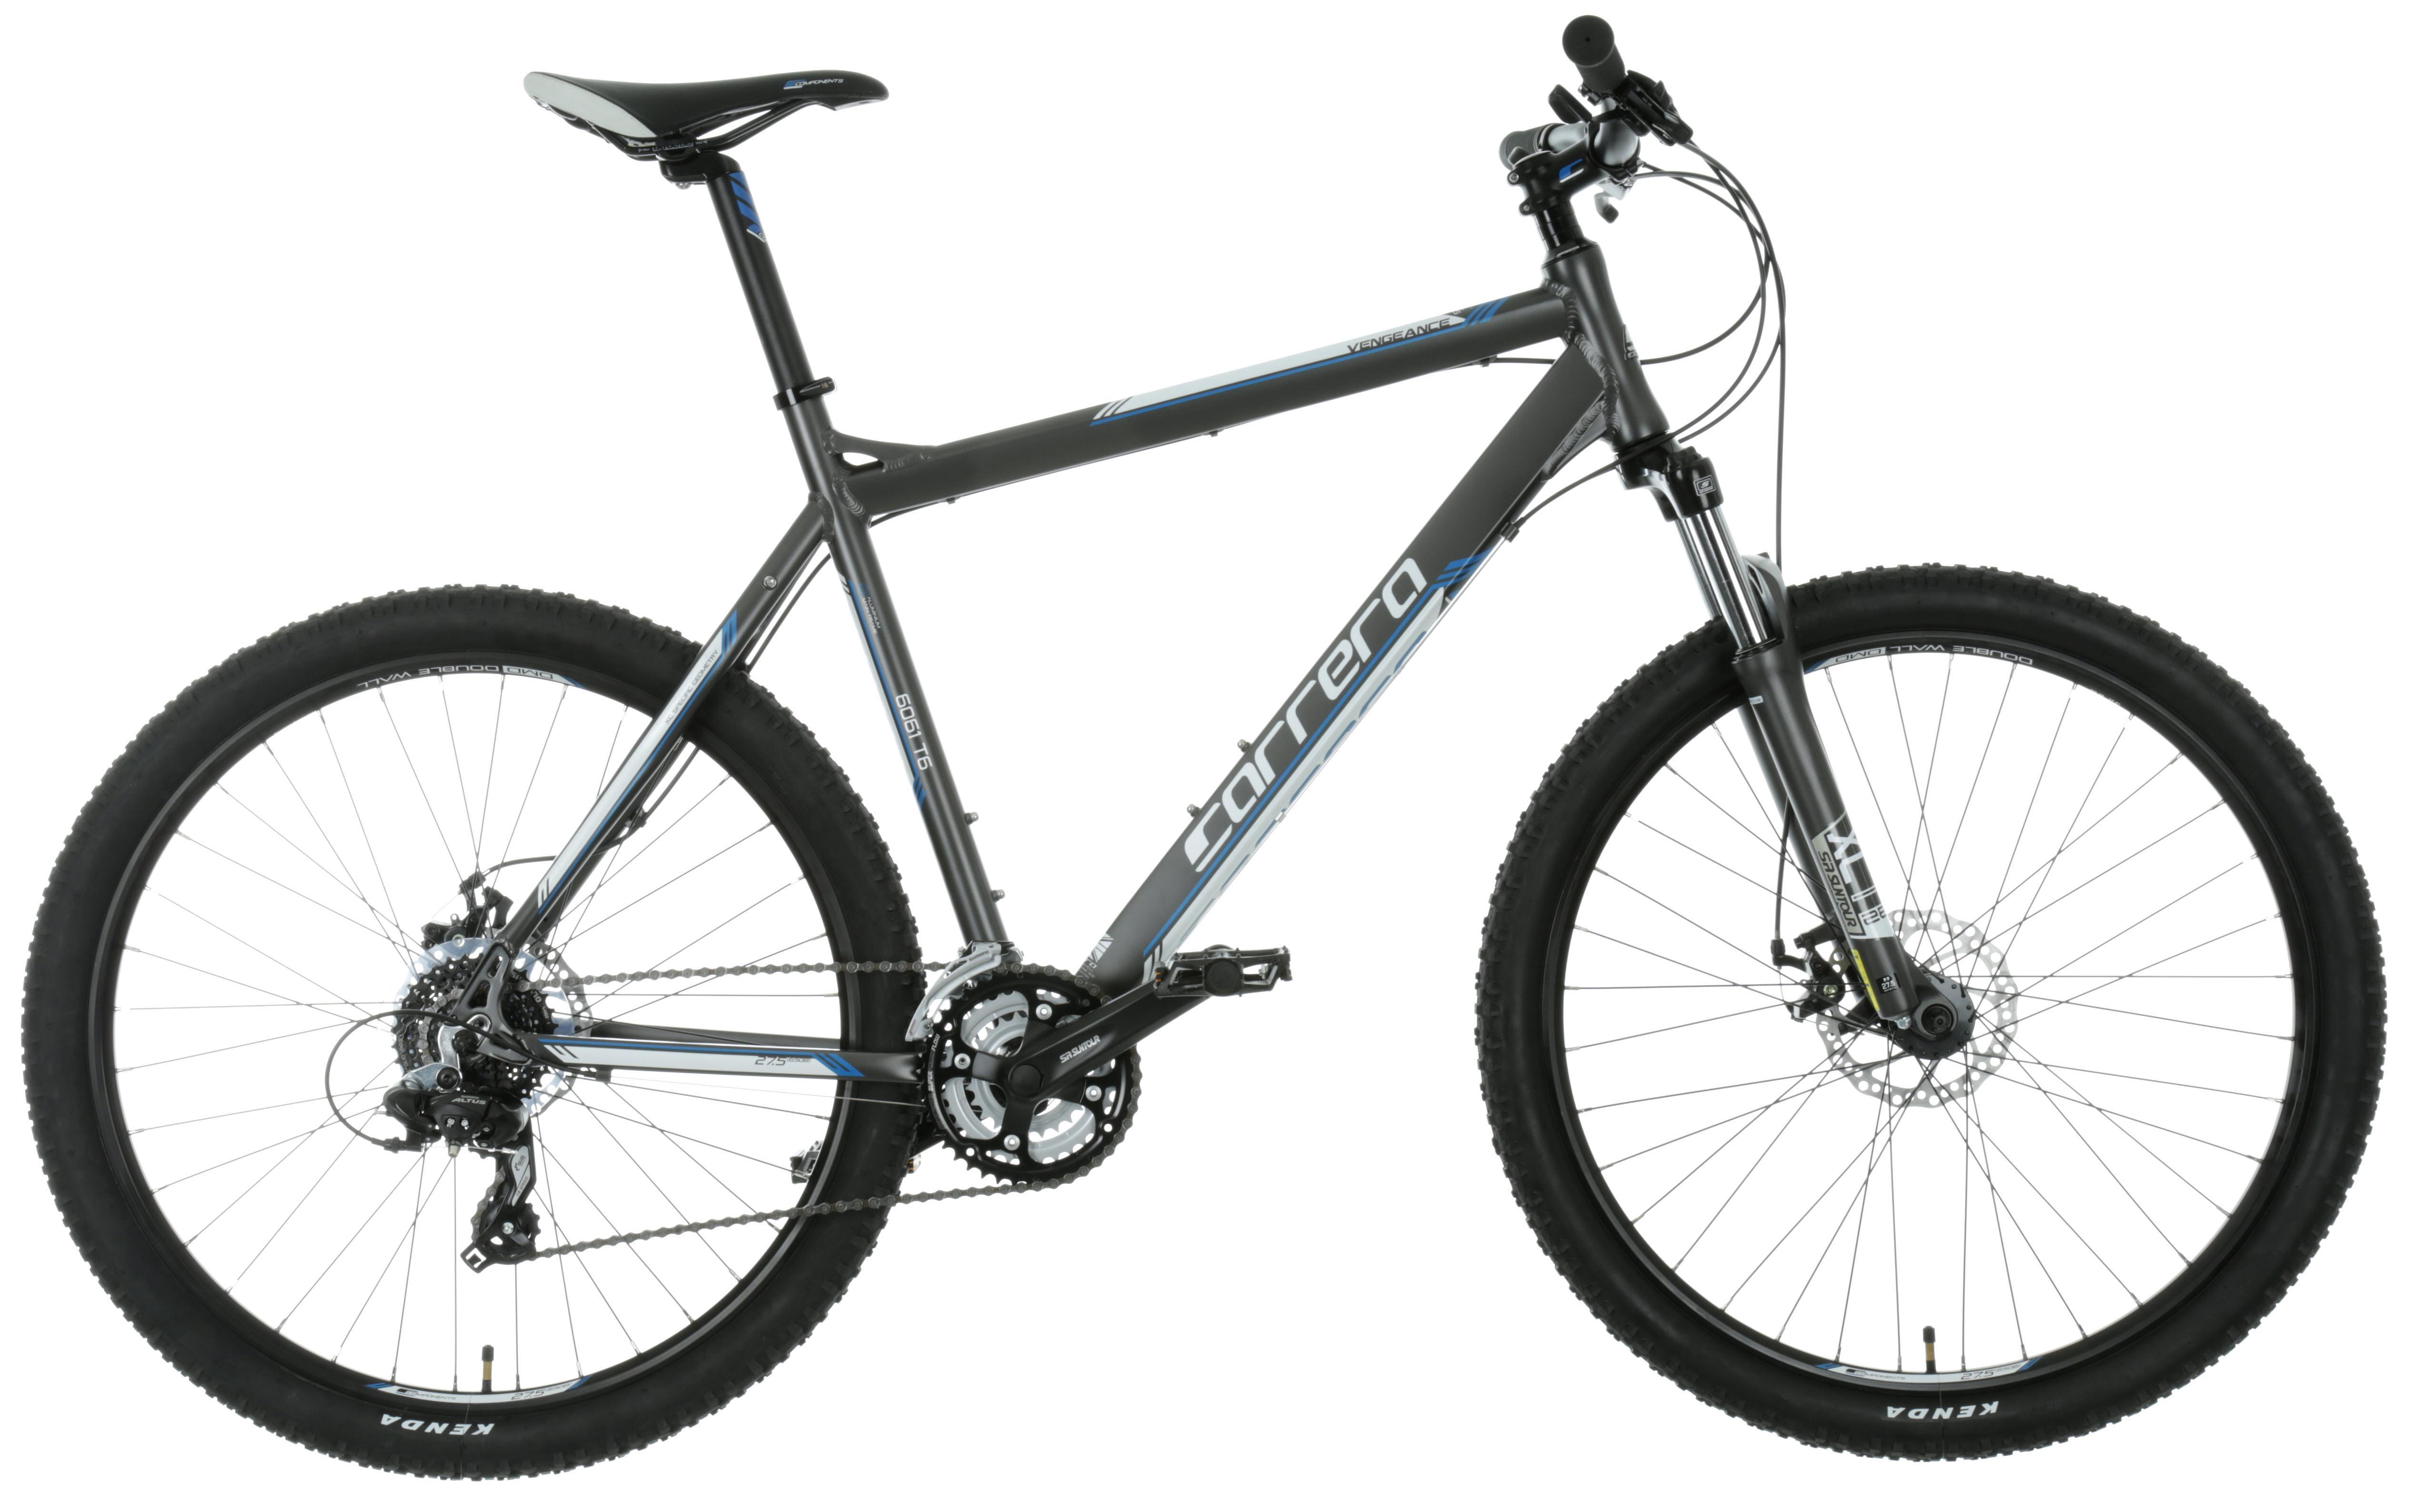 bc60f7baea9 Carrera Vengeance Mens MTB Mountain Bike Alloy Frame 27.5